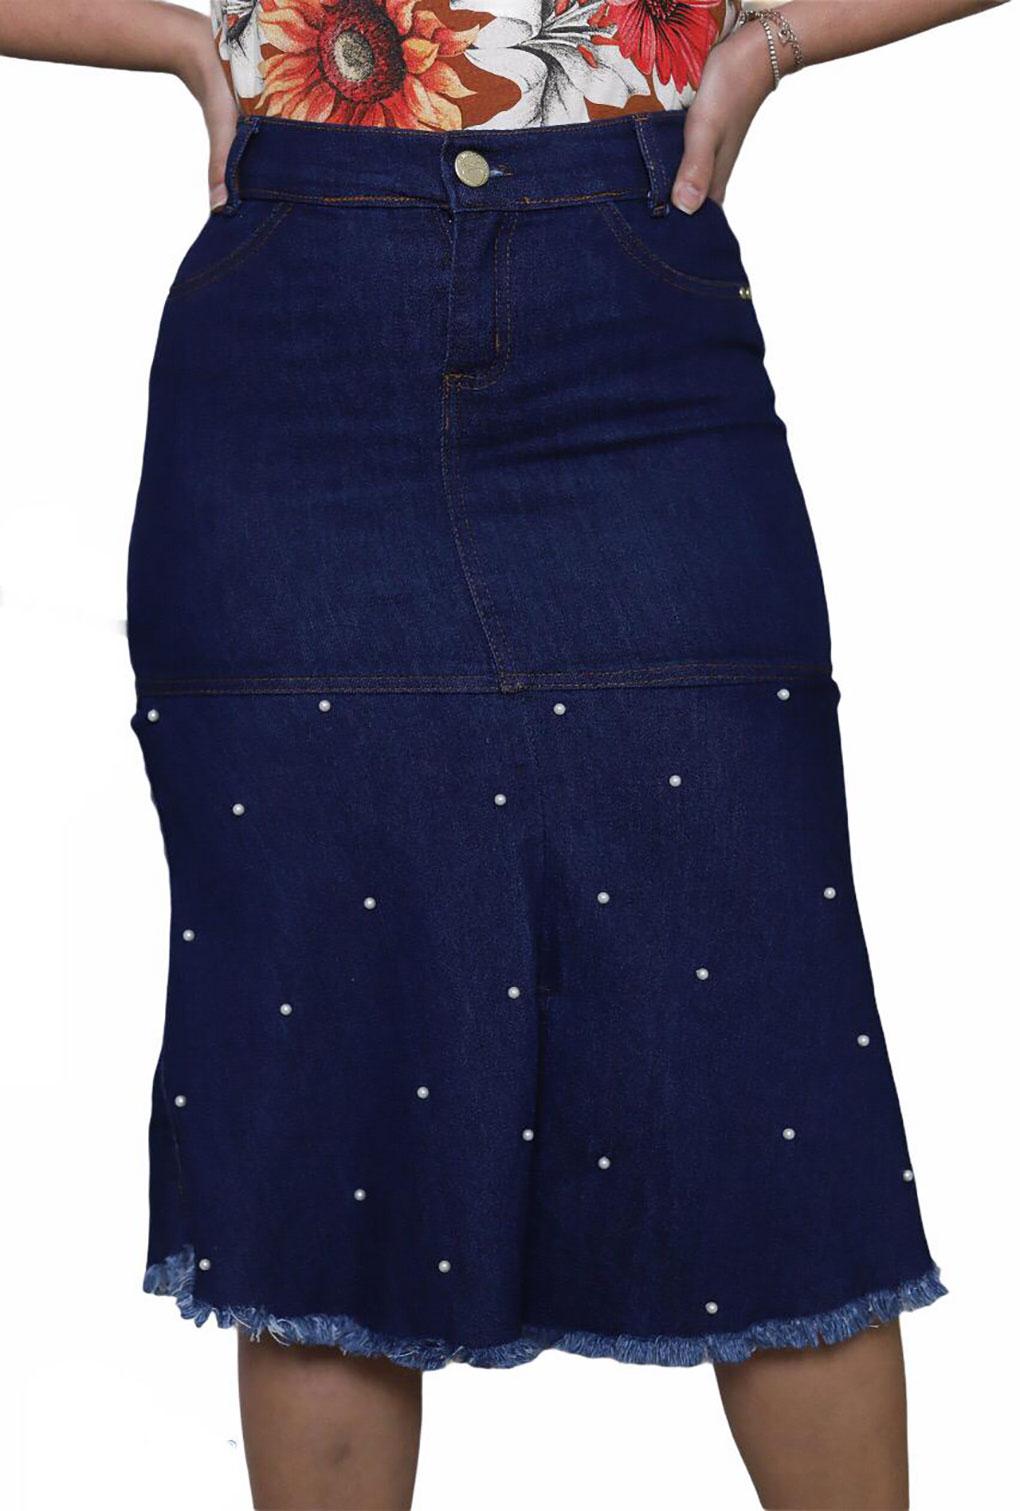 Saia Jeans Midi Babado Com Detalhe Perola  - ModaStore | Moda Feminina